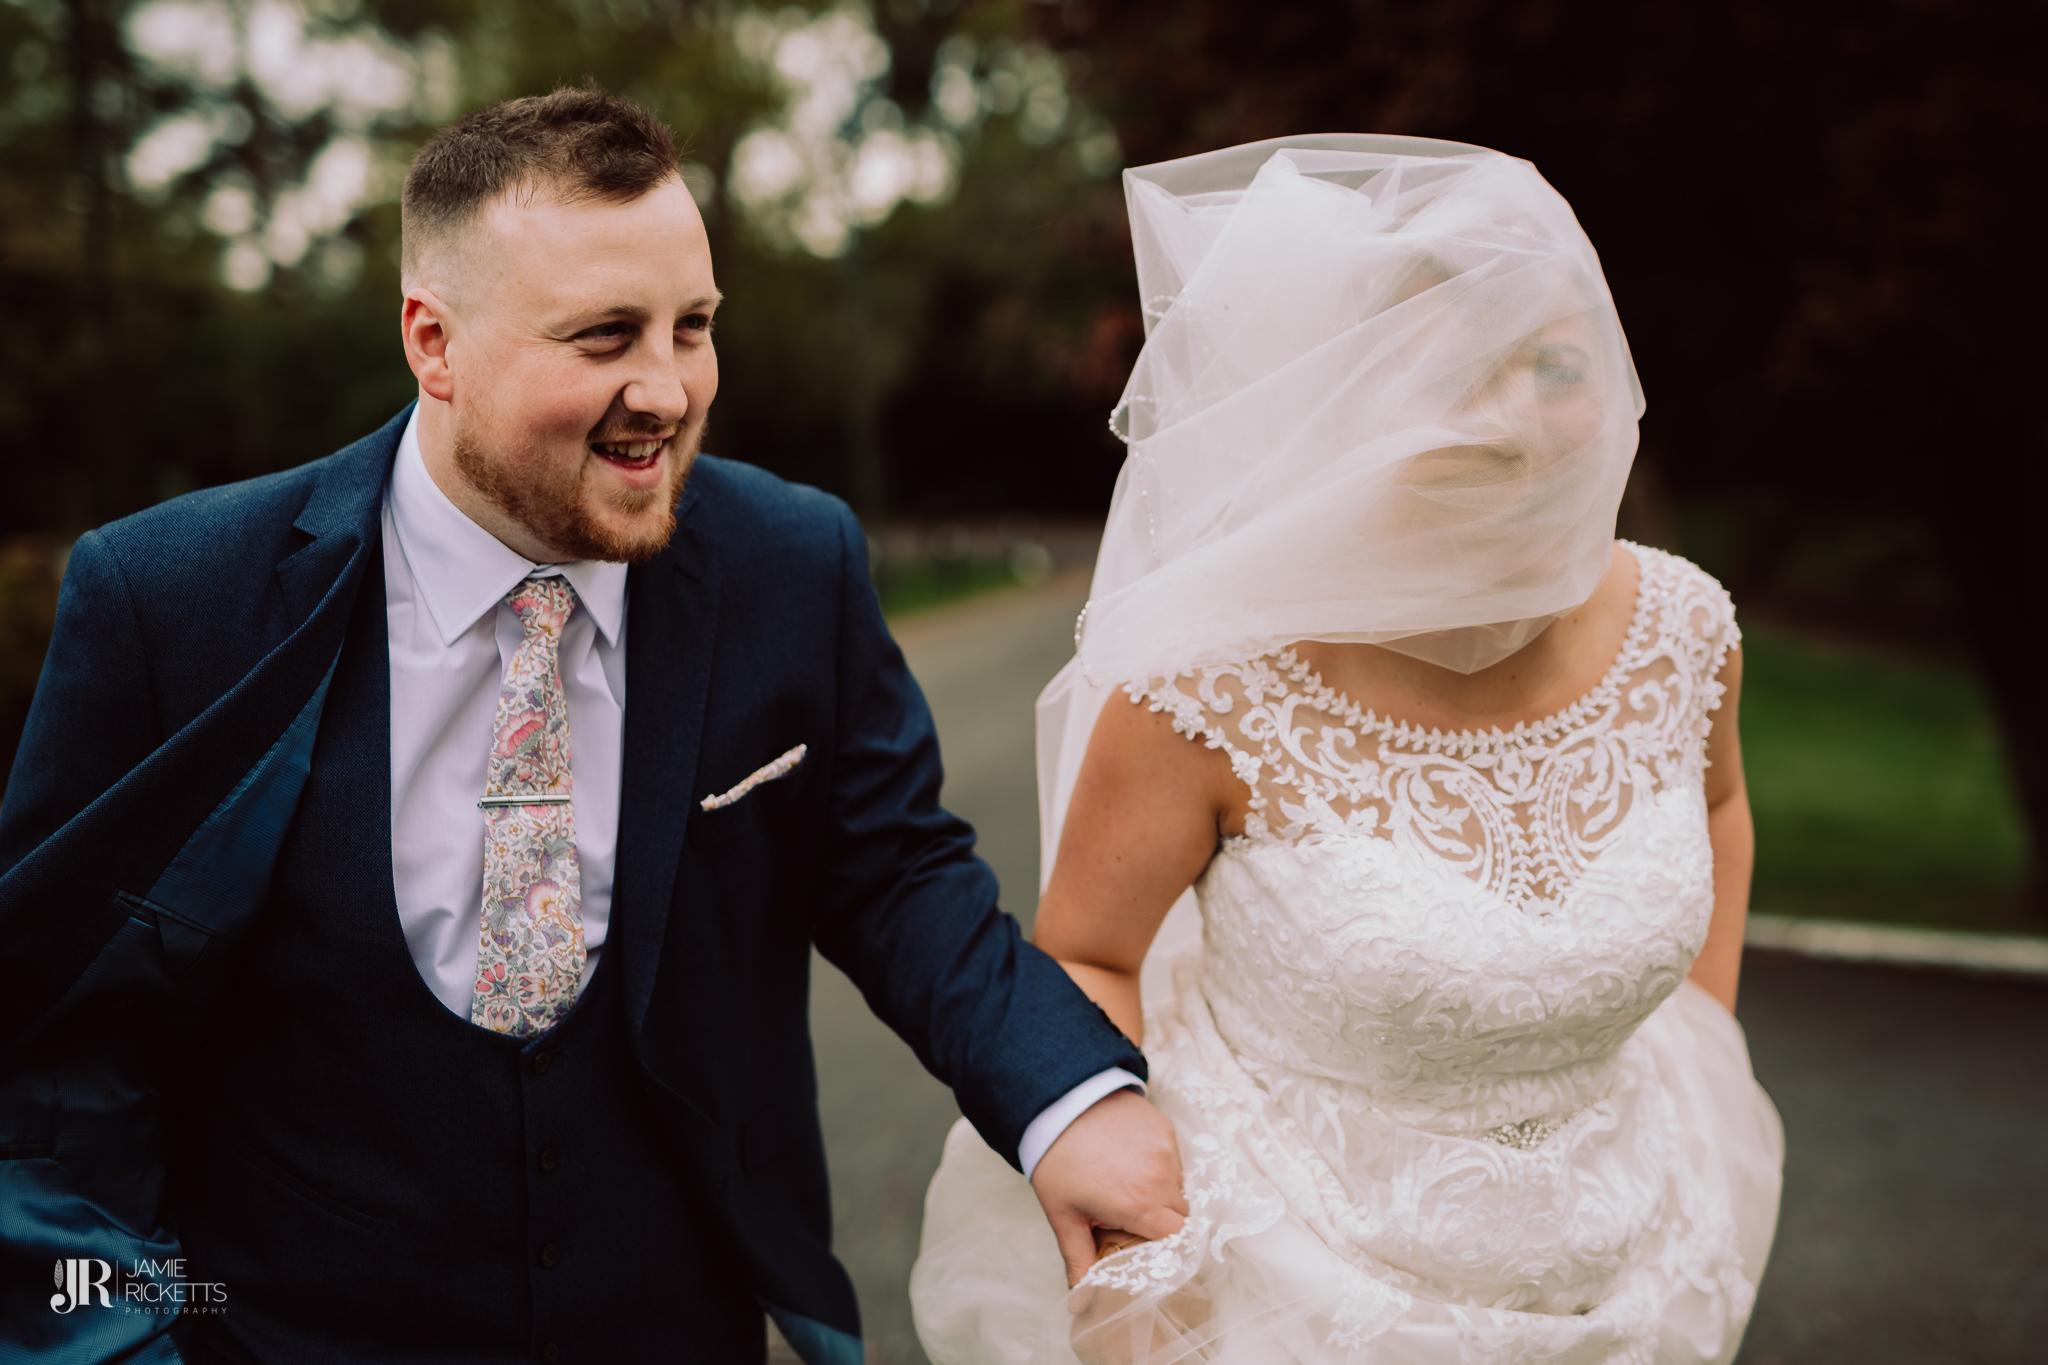 Wedding-Photographer-Shropshire-10.JPG